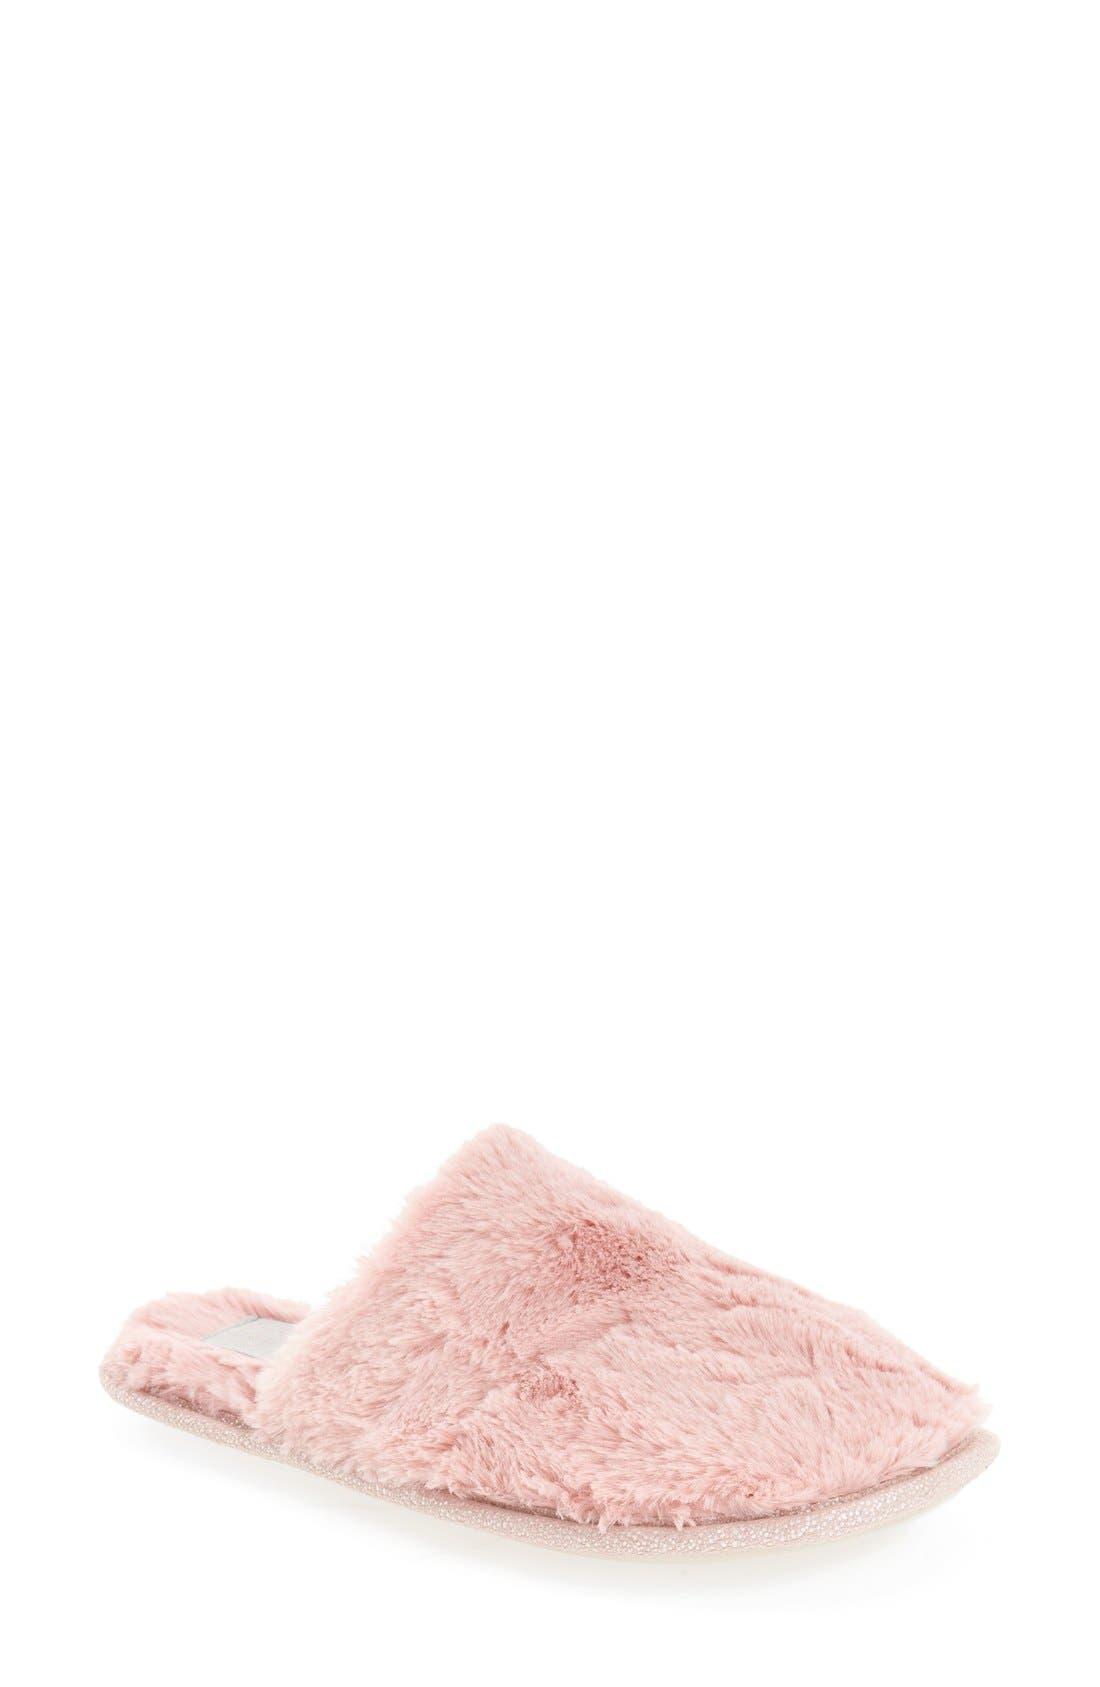 'Holland' Scuff Slipper,                             Main thumbnail 1, color,                             Blush Fabric